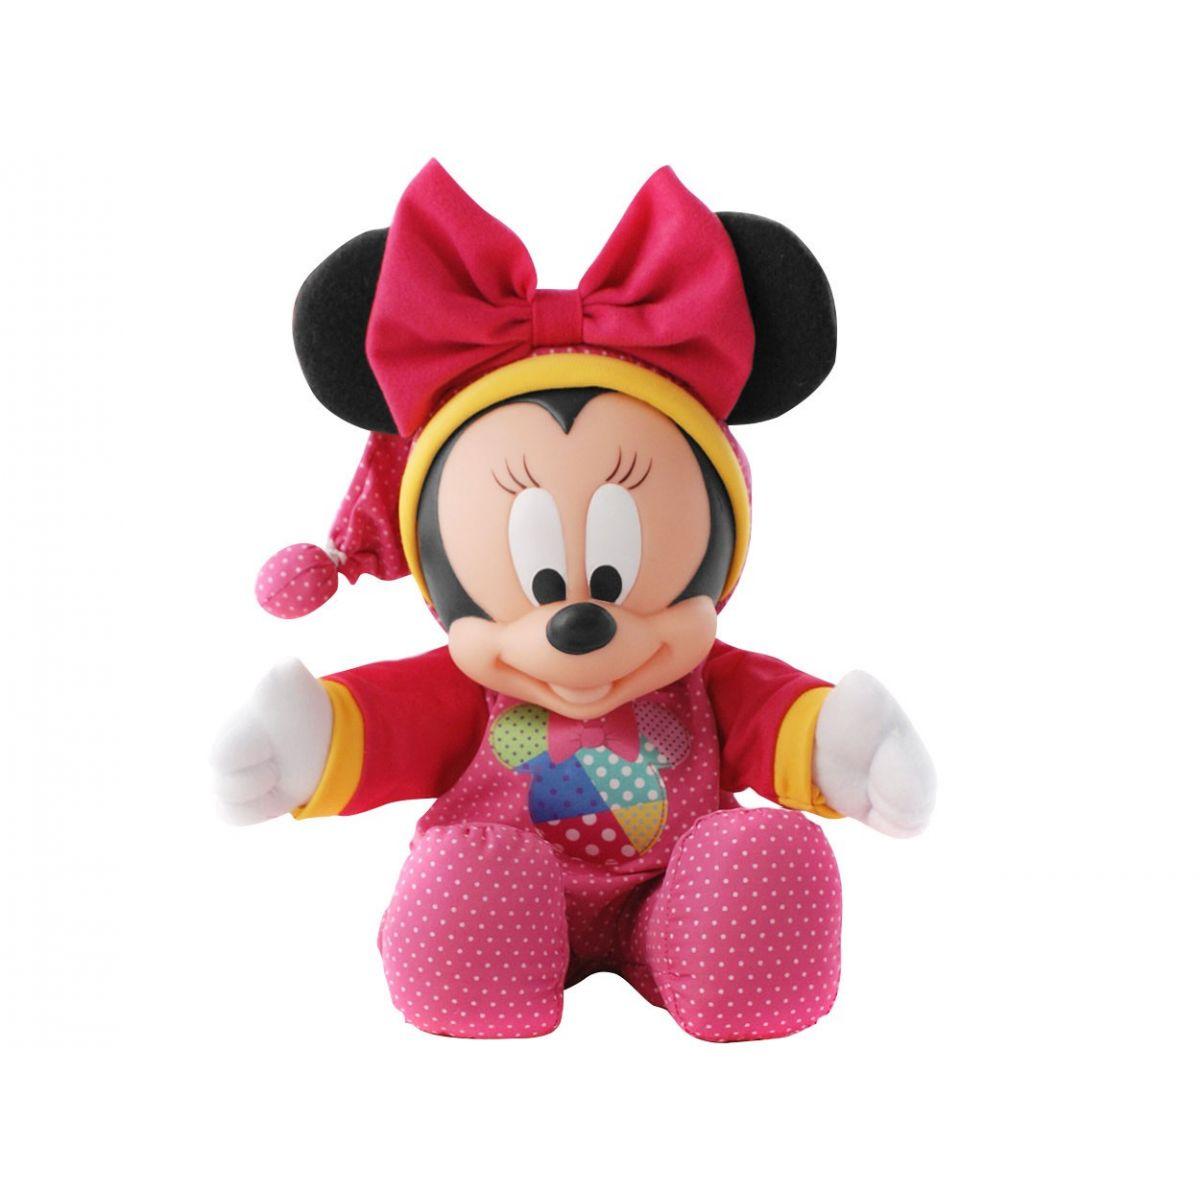 Boneca Minnie Kids Disney - Multibrink